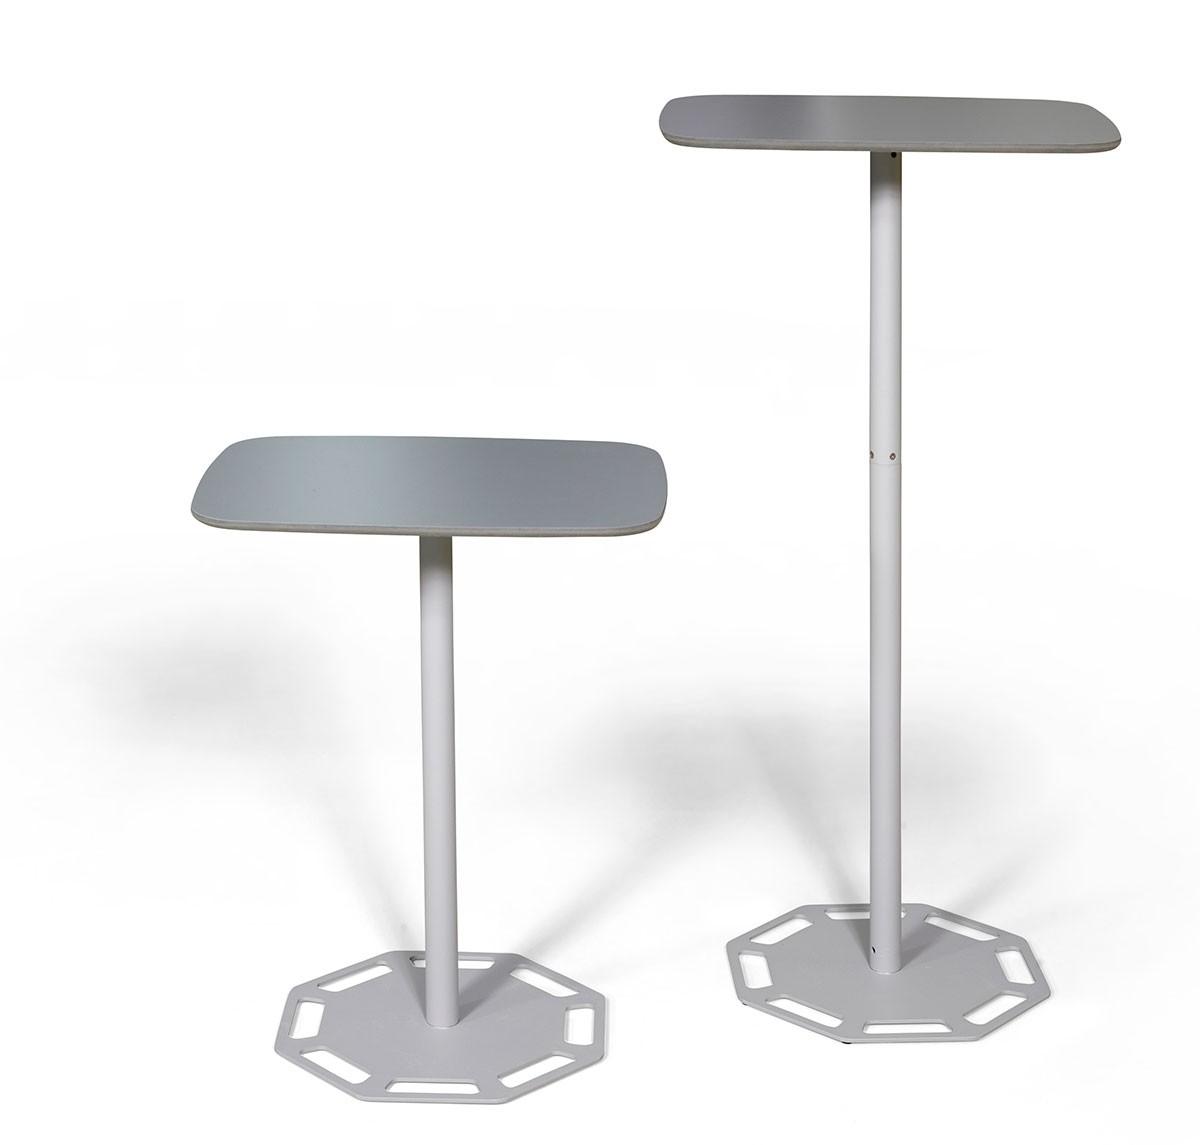 Expolinc Portable Table